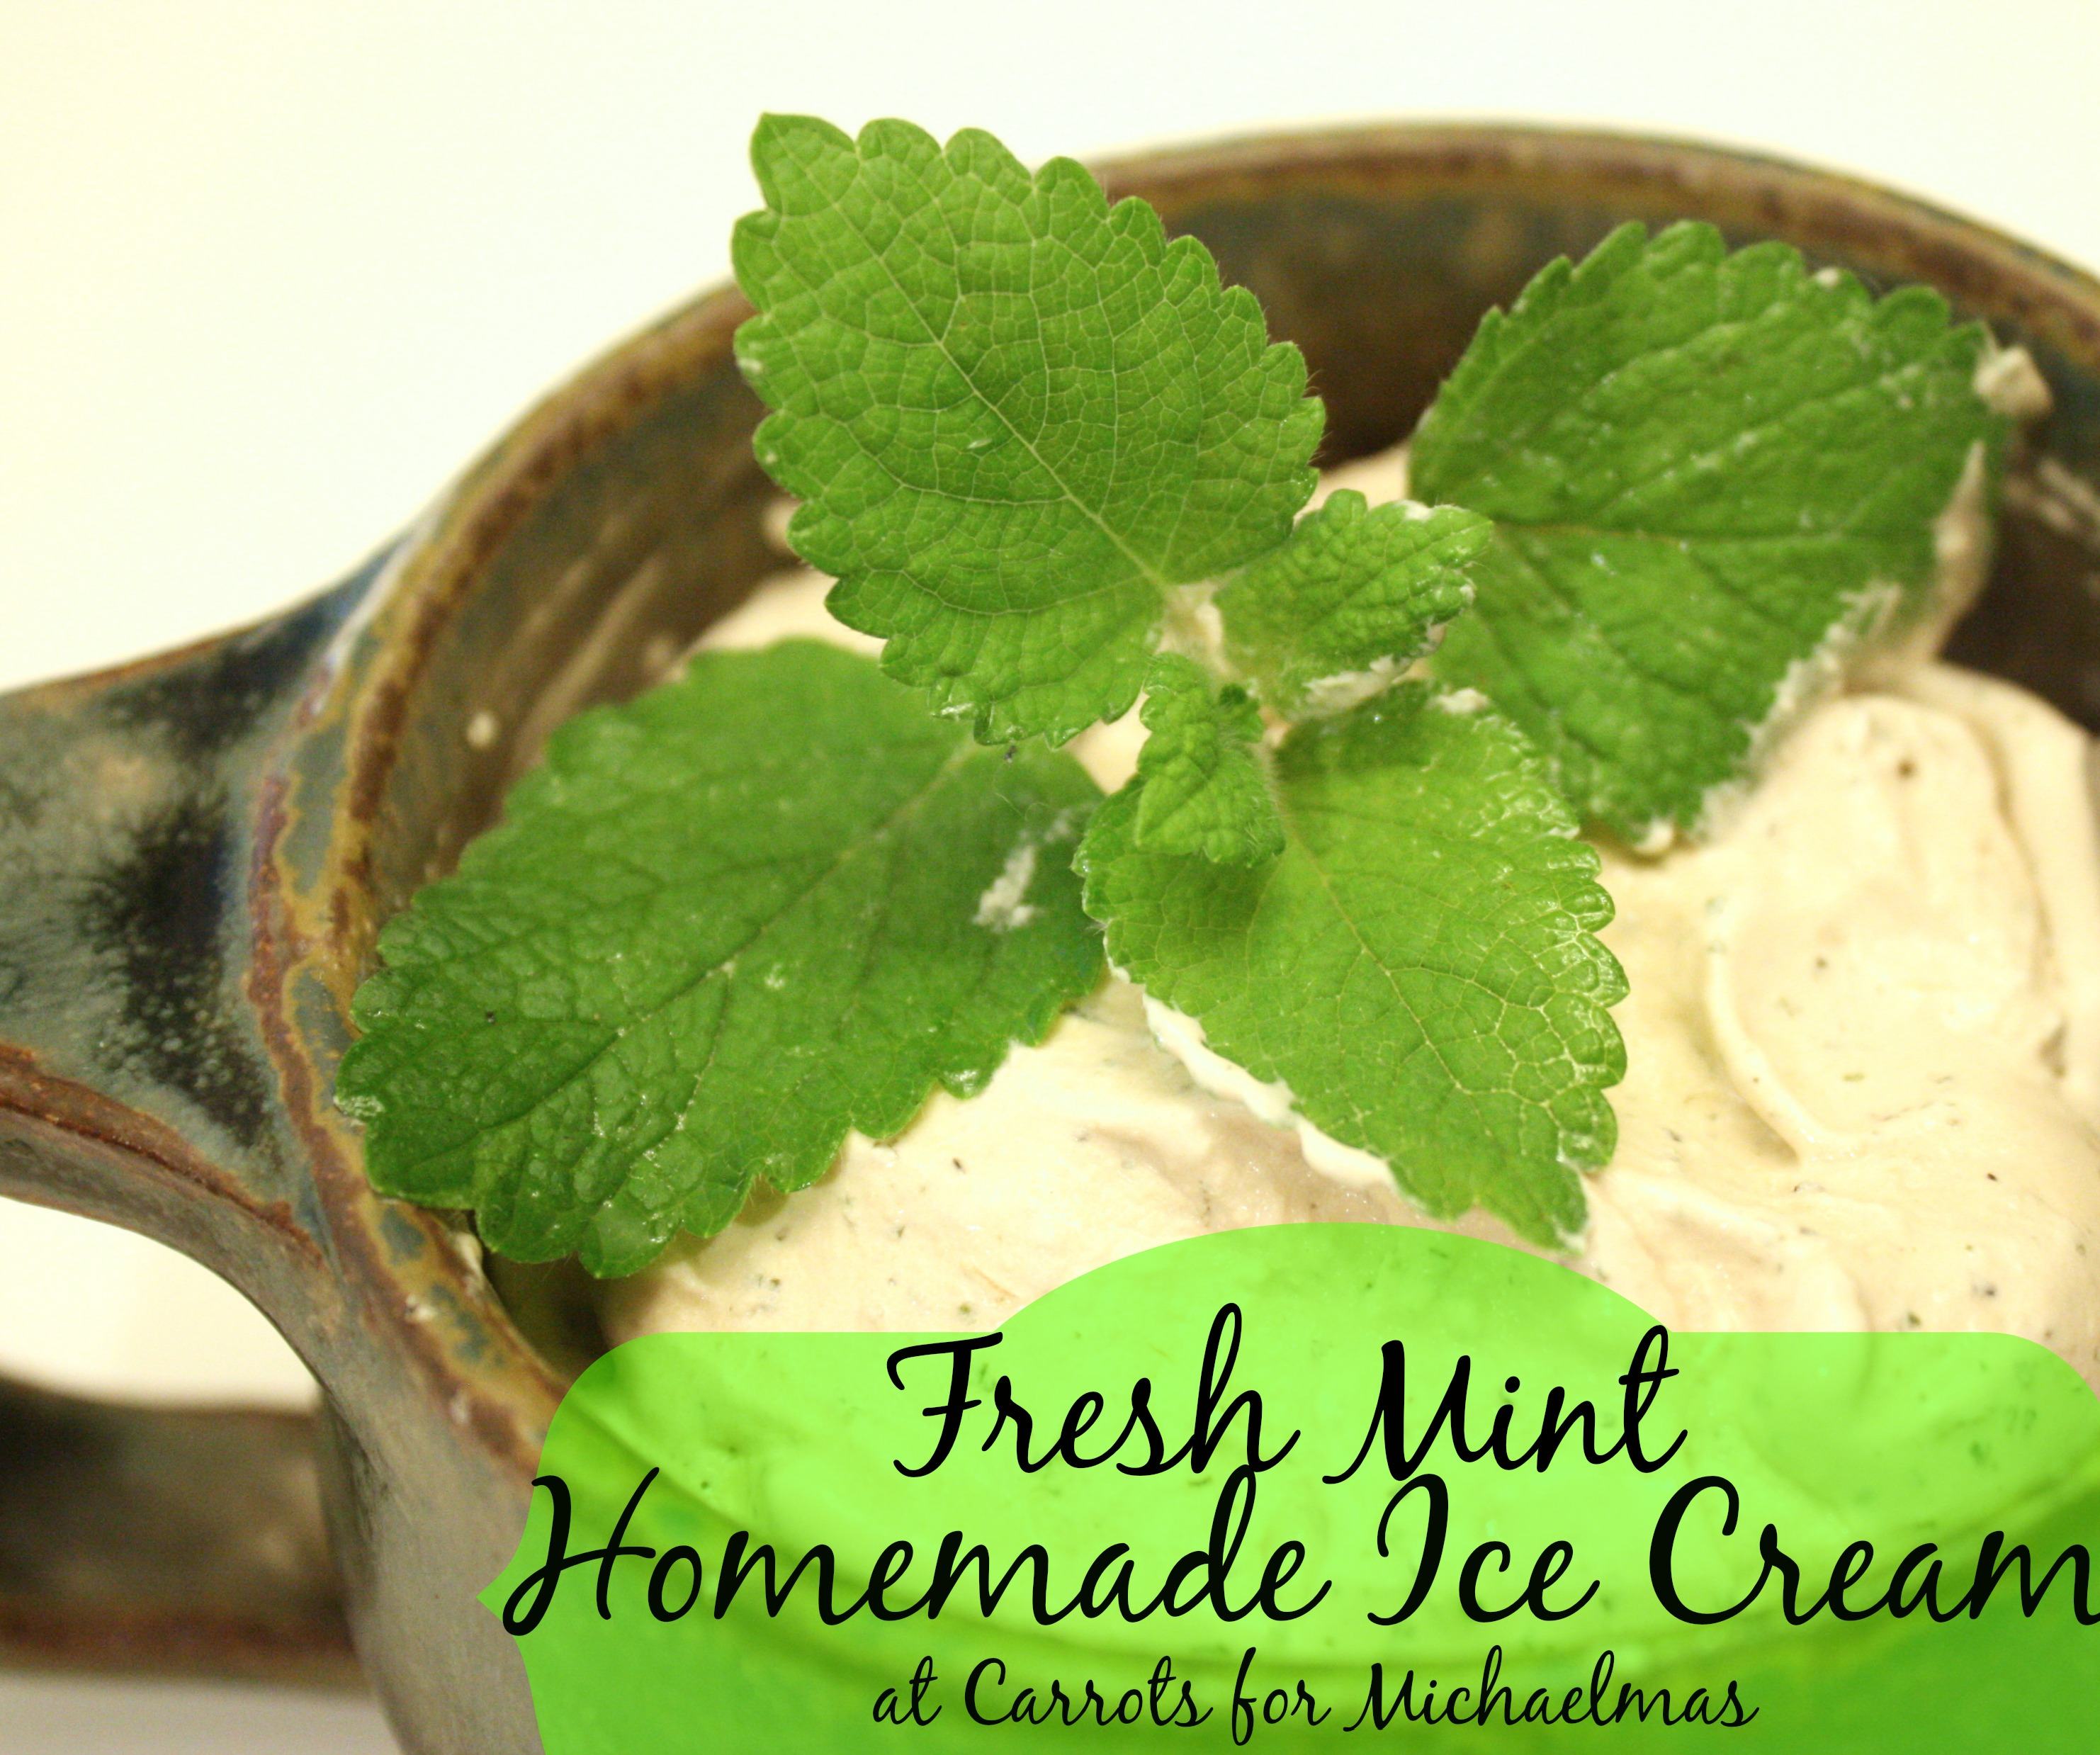 From The Garden Fresh Mint Homemade Ice Cream Recipe